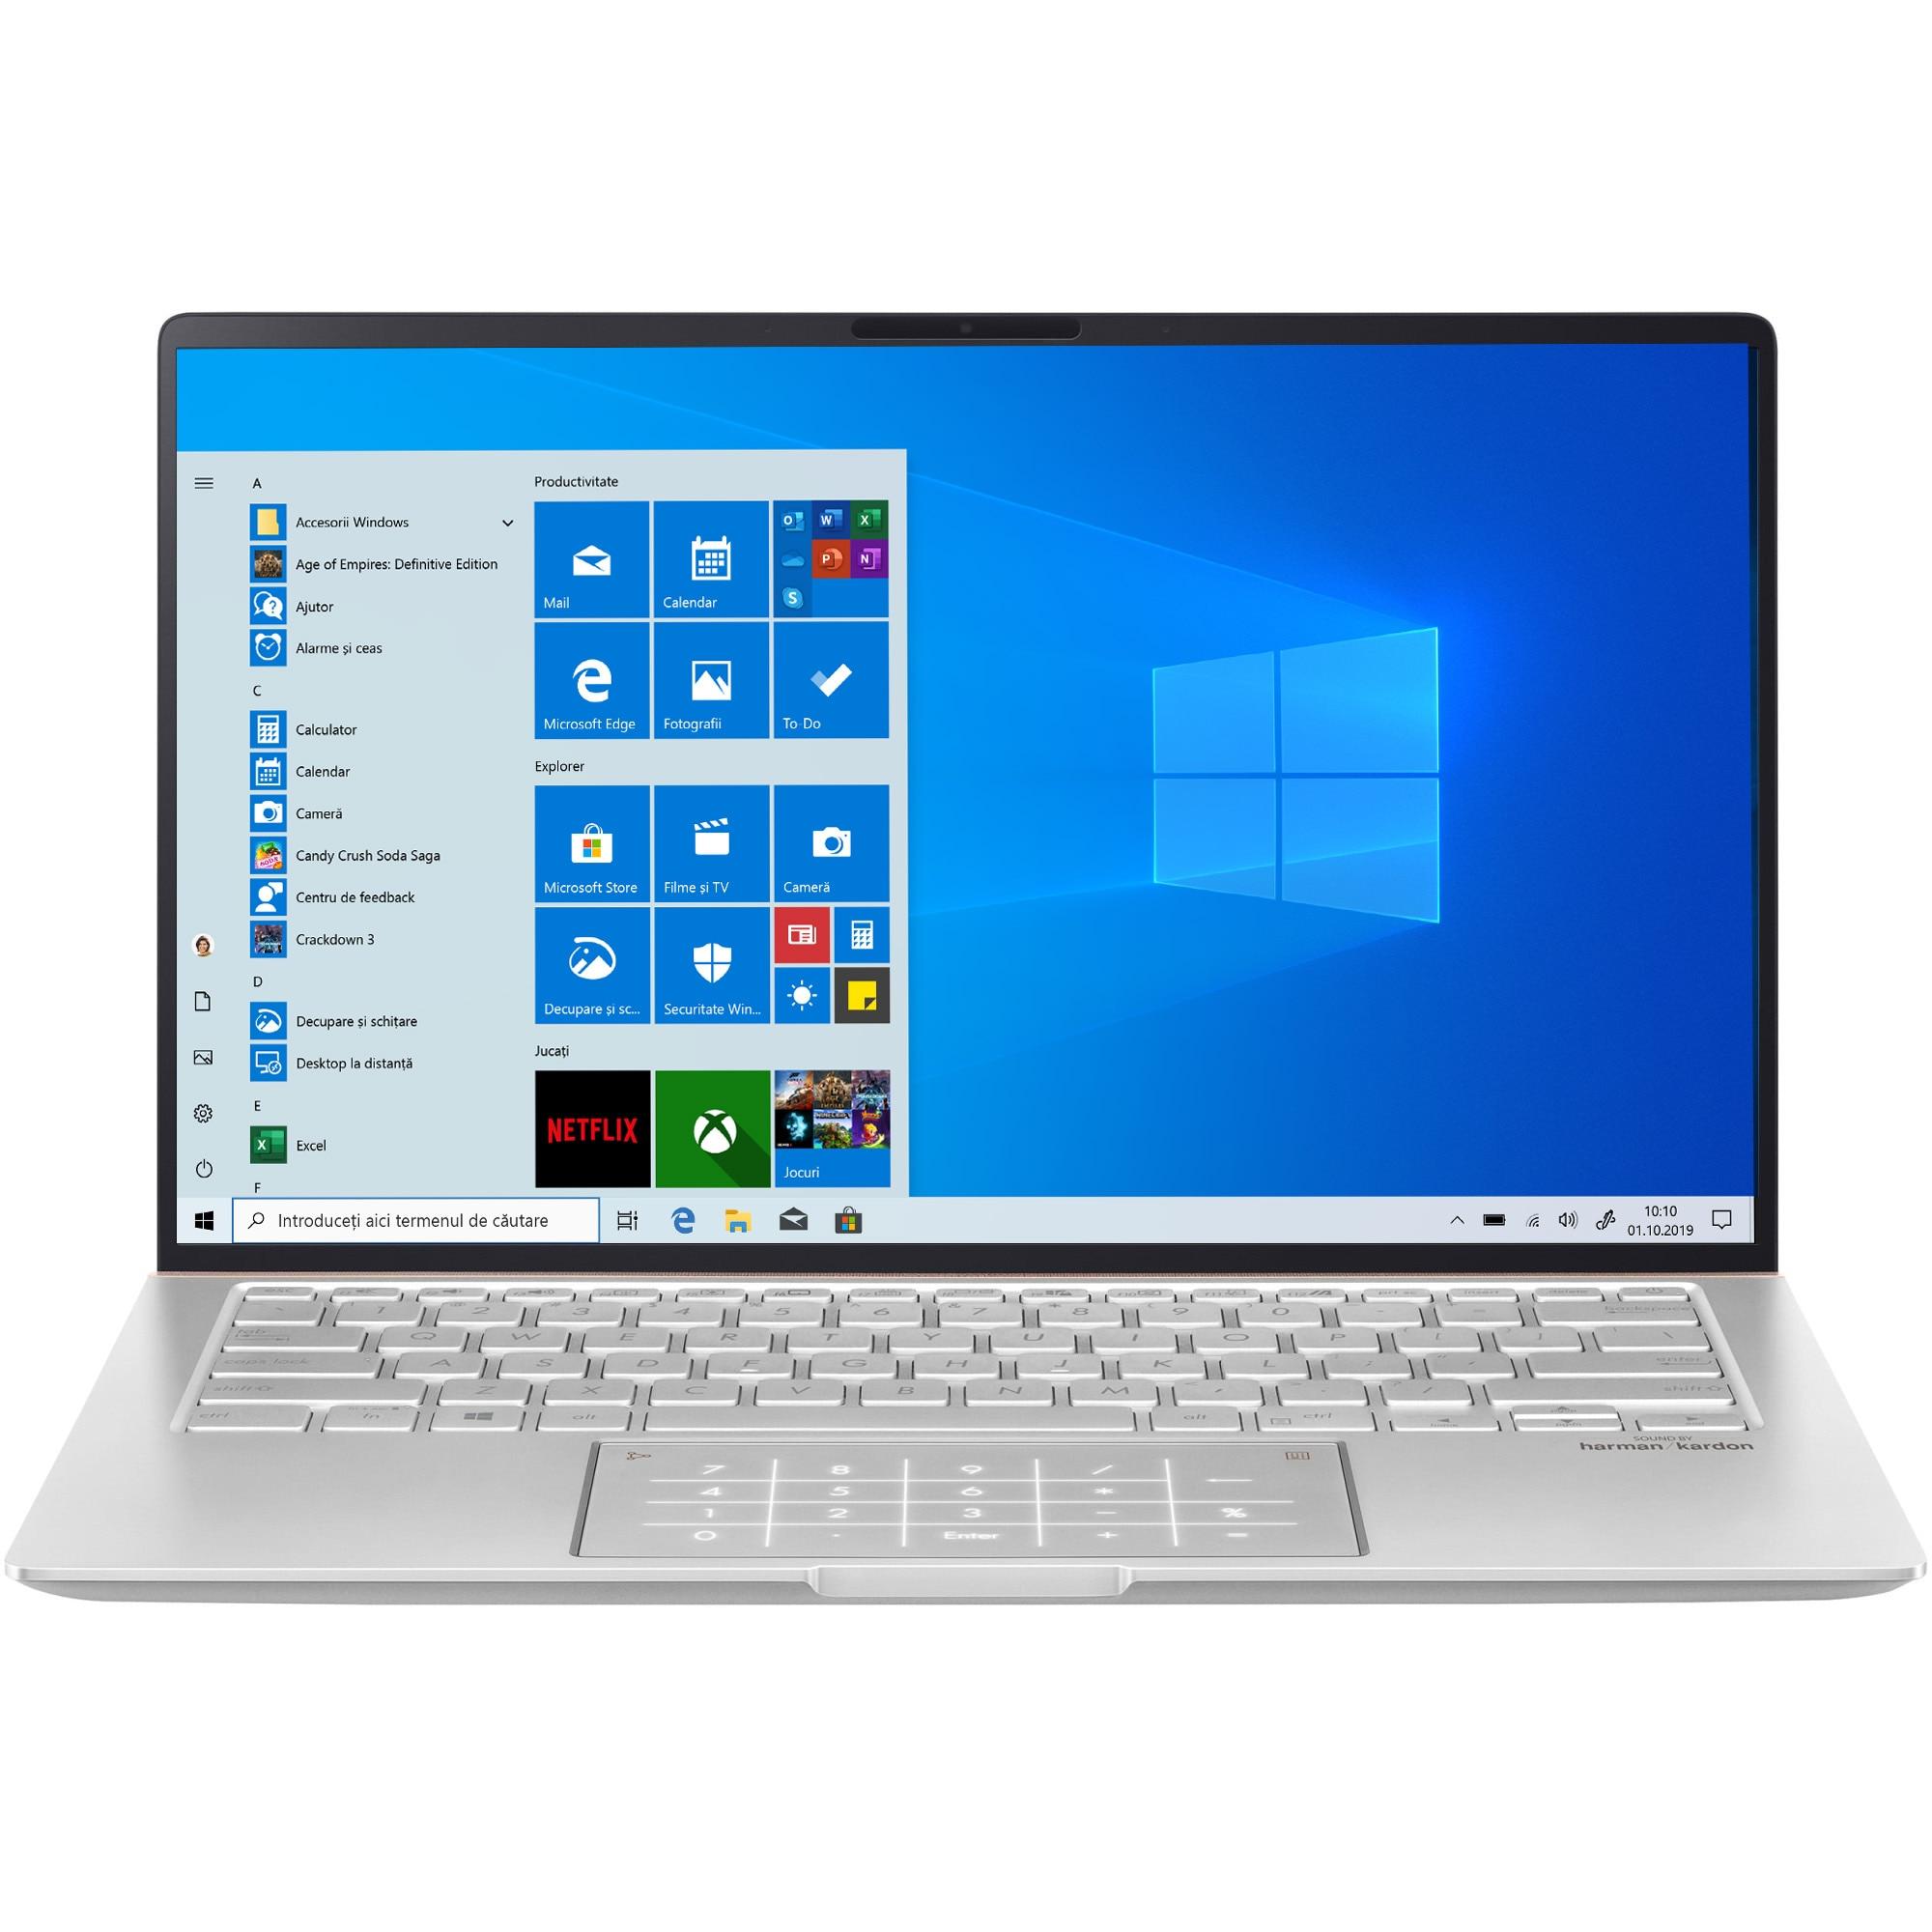 "Fotografie Laptop ultraportabil ASUS ZenBook 14 UM433DA cu processor AMD Ryzen™ 7 3700U pana la 4.00 GHz, 14"", Full HD, 16GB, 1TB SSD, Radeon™ RX Vega 10 Graphics, Windows 10 Pro, Icicle Silver"